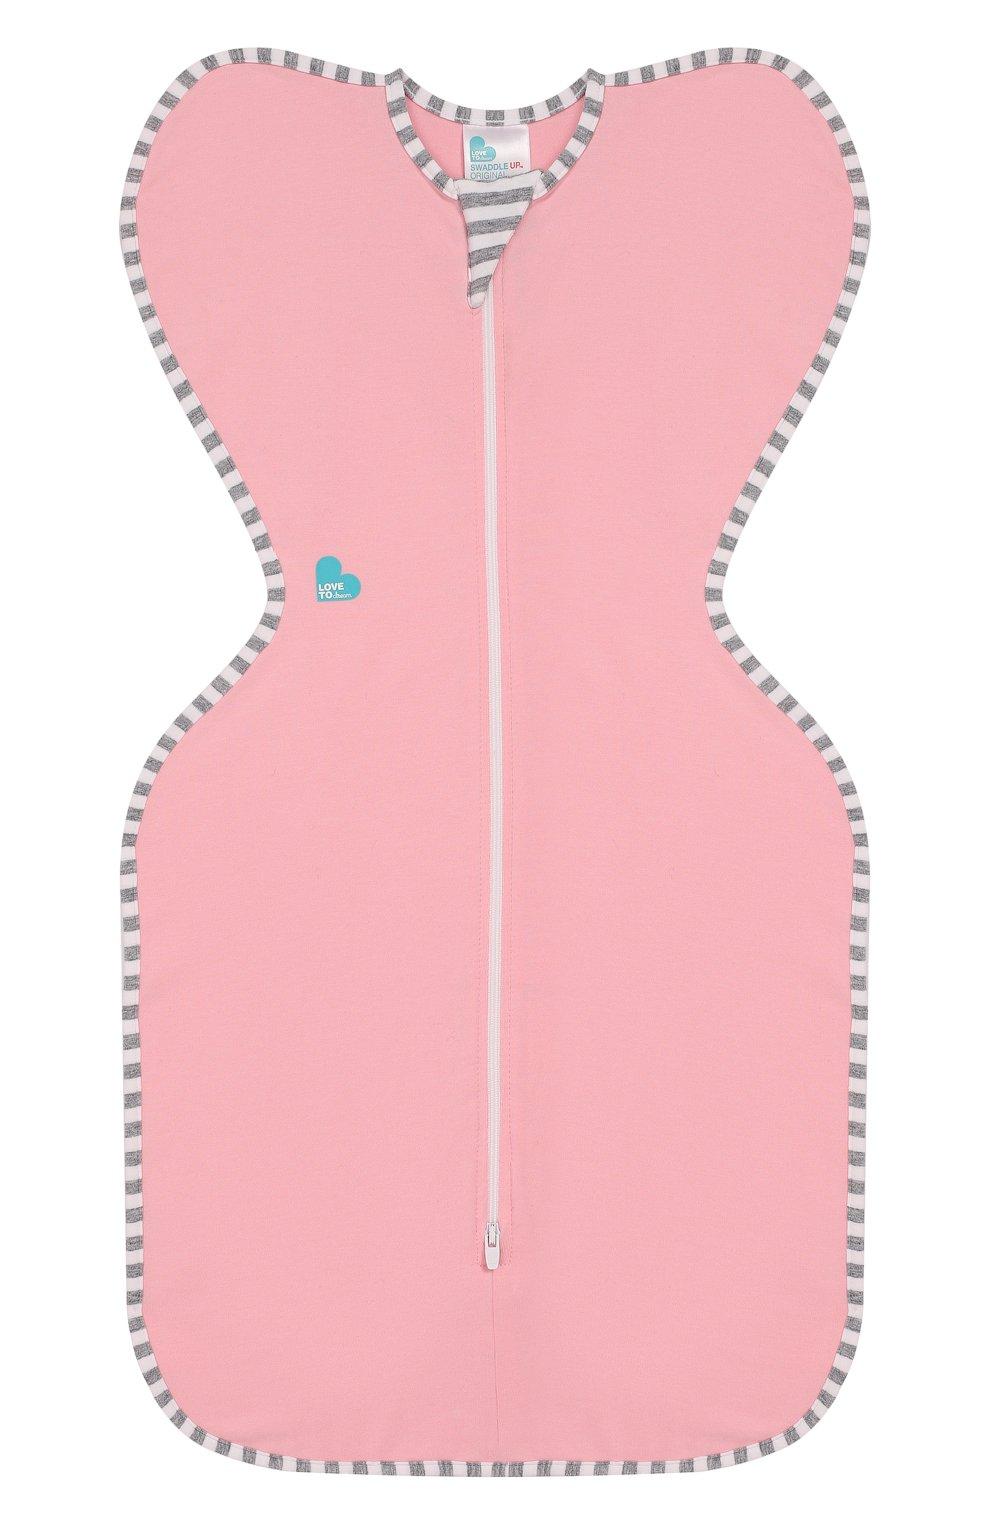 Детский спальный комбинезон LOVE TO DREAM розового цвета, арт. L10 01 001 PK M | Фото 1